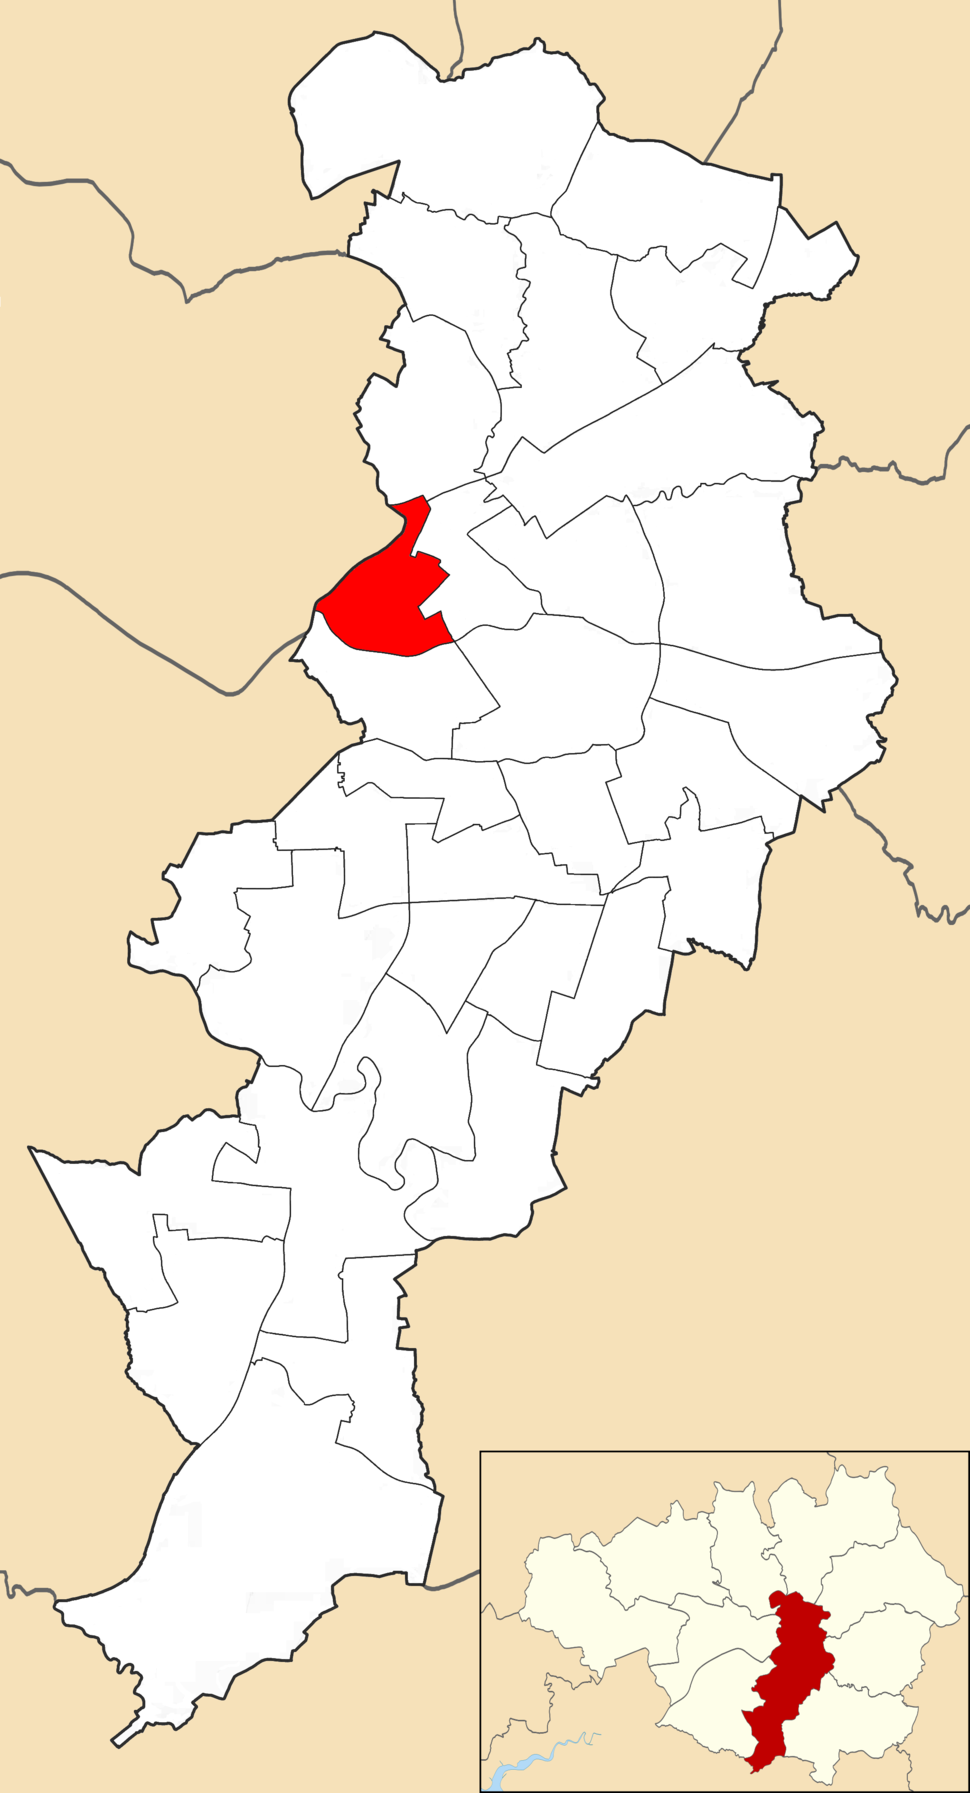 Deansgate (Manchester City Council ward) 2018